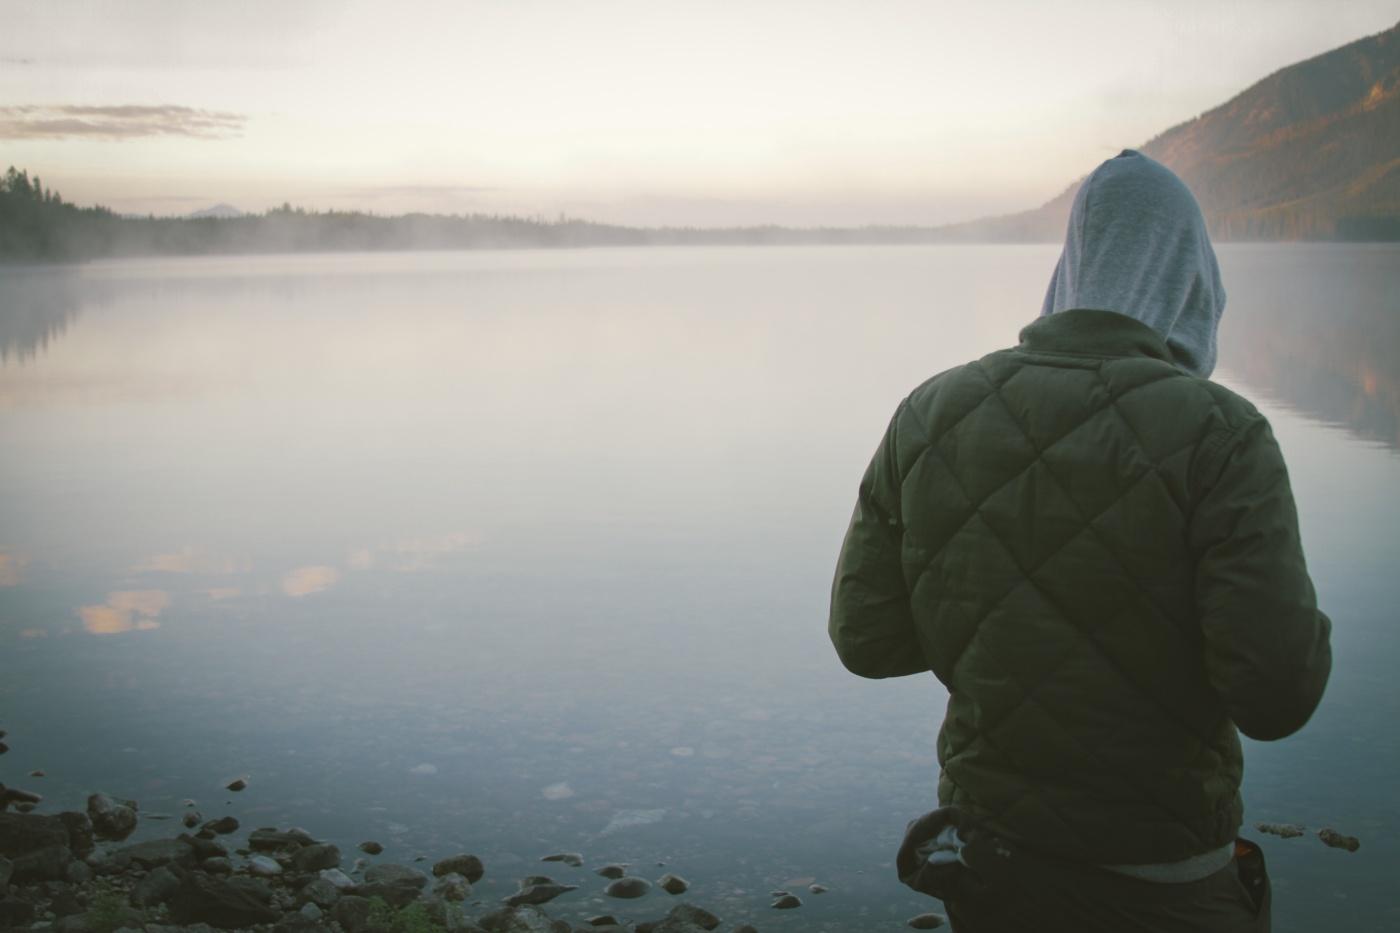 2016, mental health, and self-loving